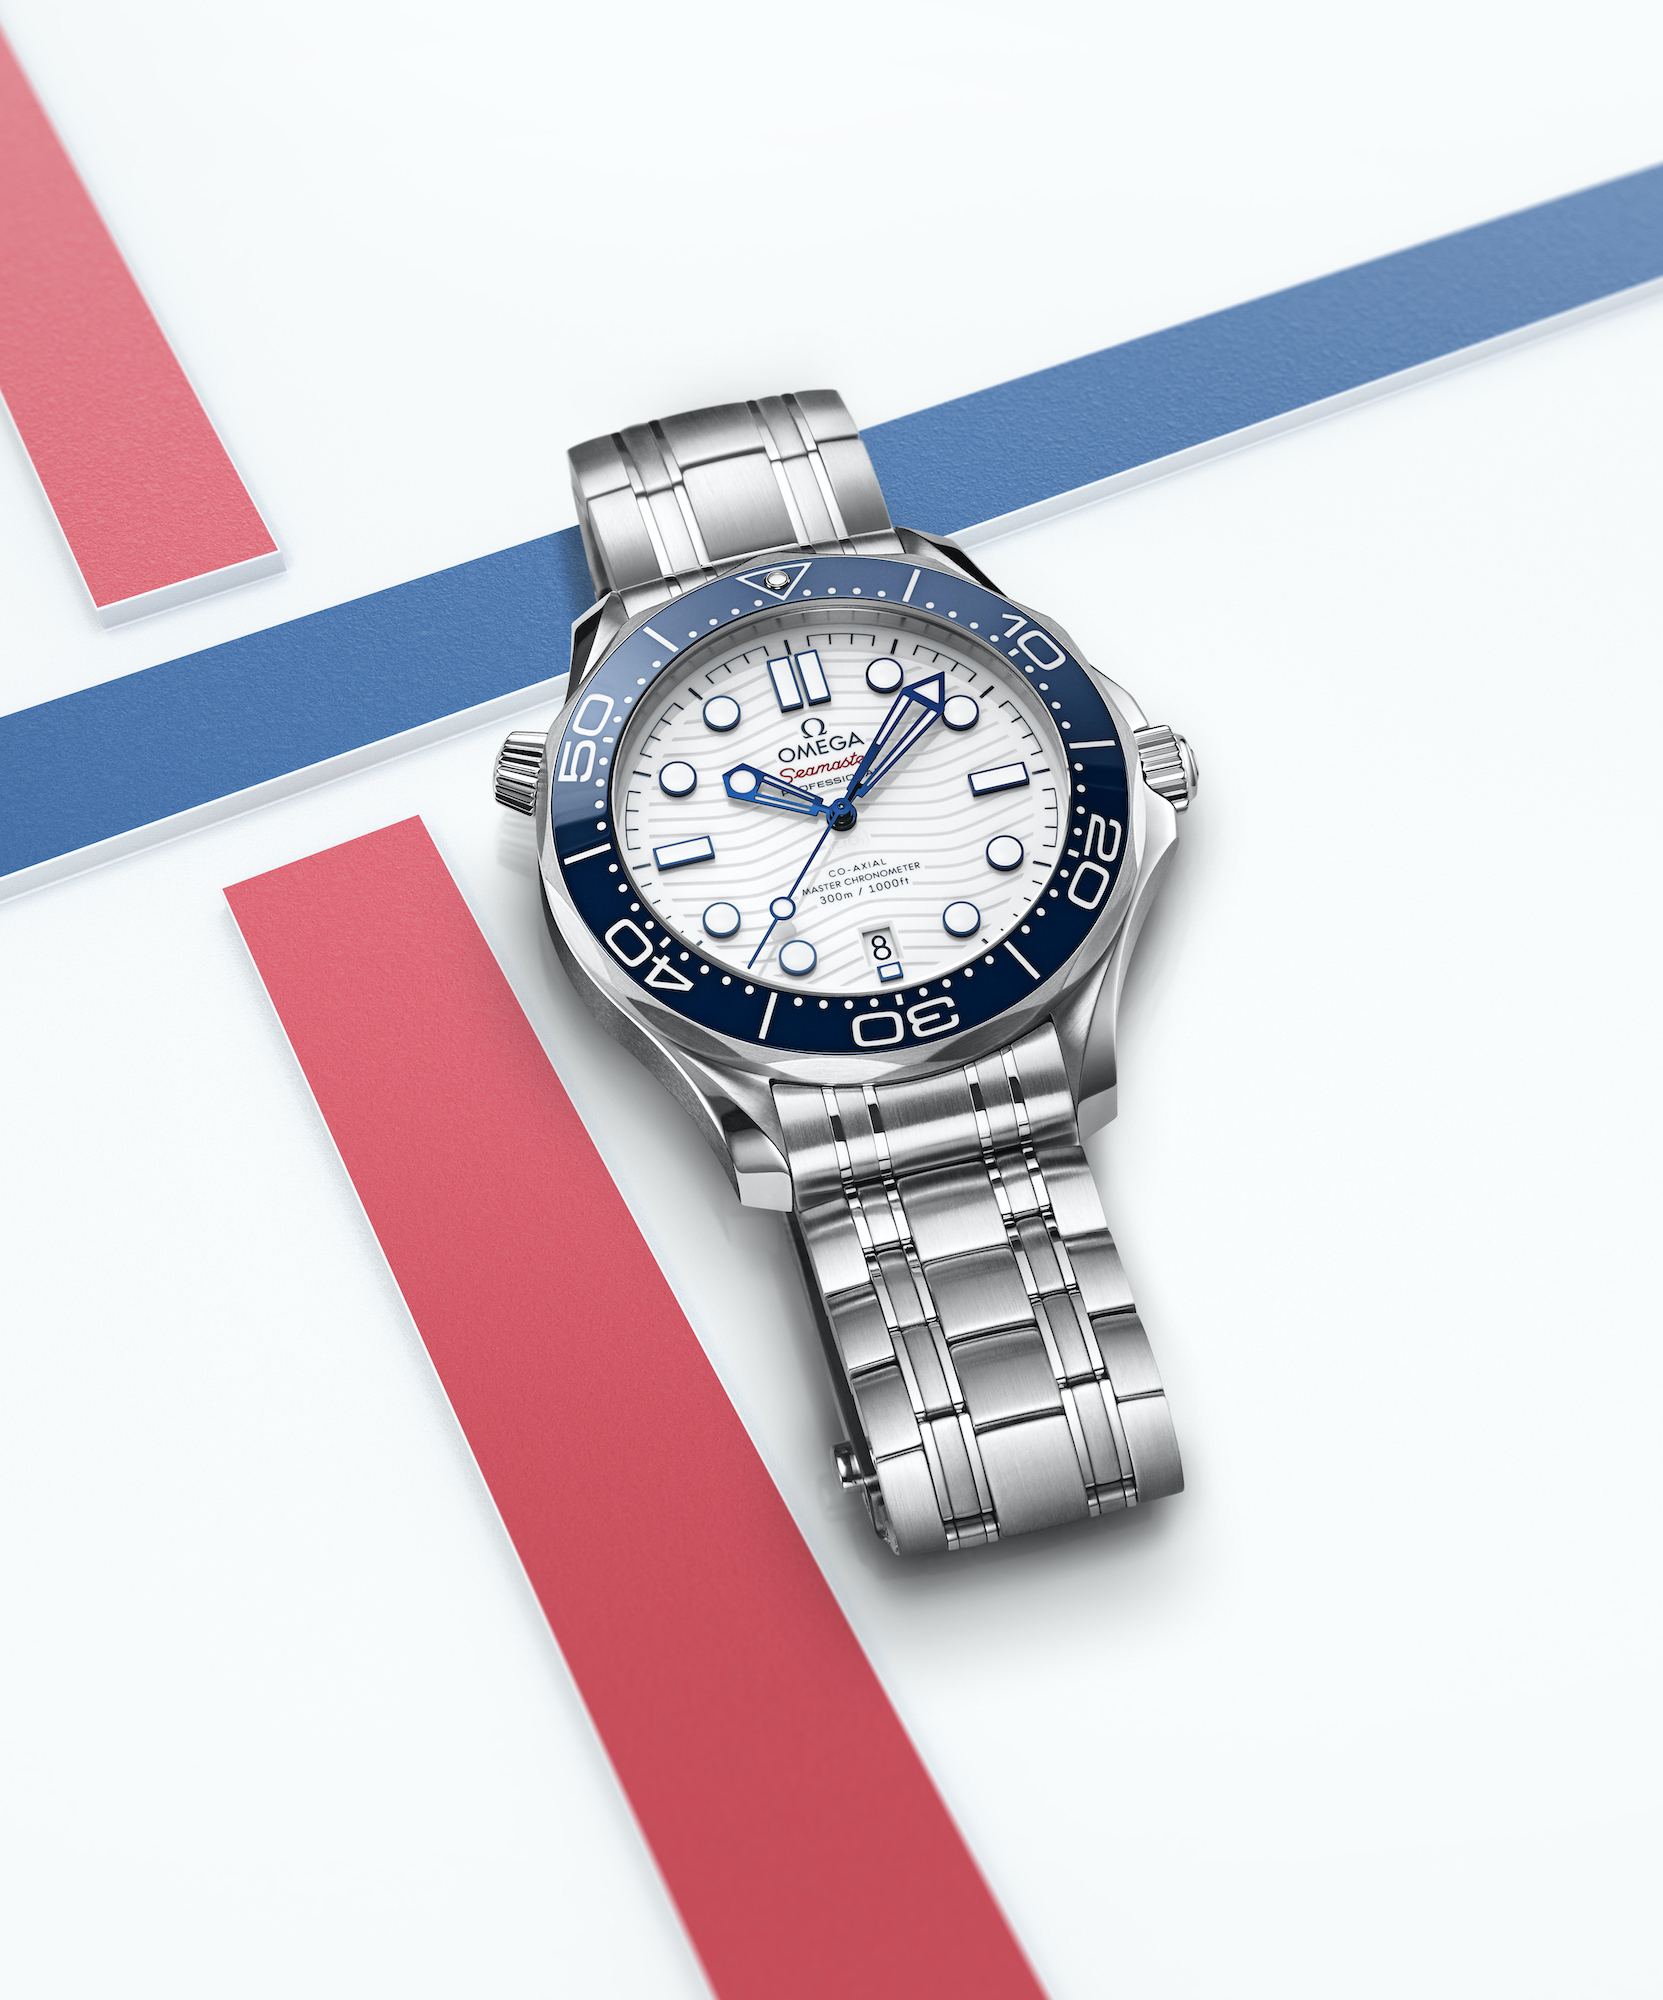 Omega Seamaster Diver 300M Tokyo 2020 522.30.42.20.04.001 Lifestyle